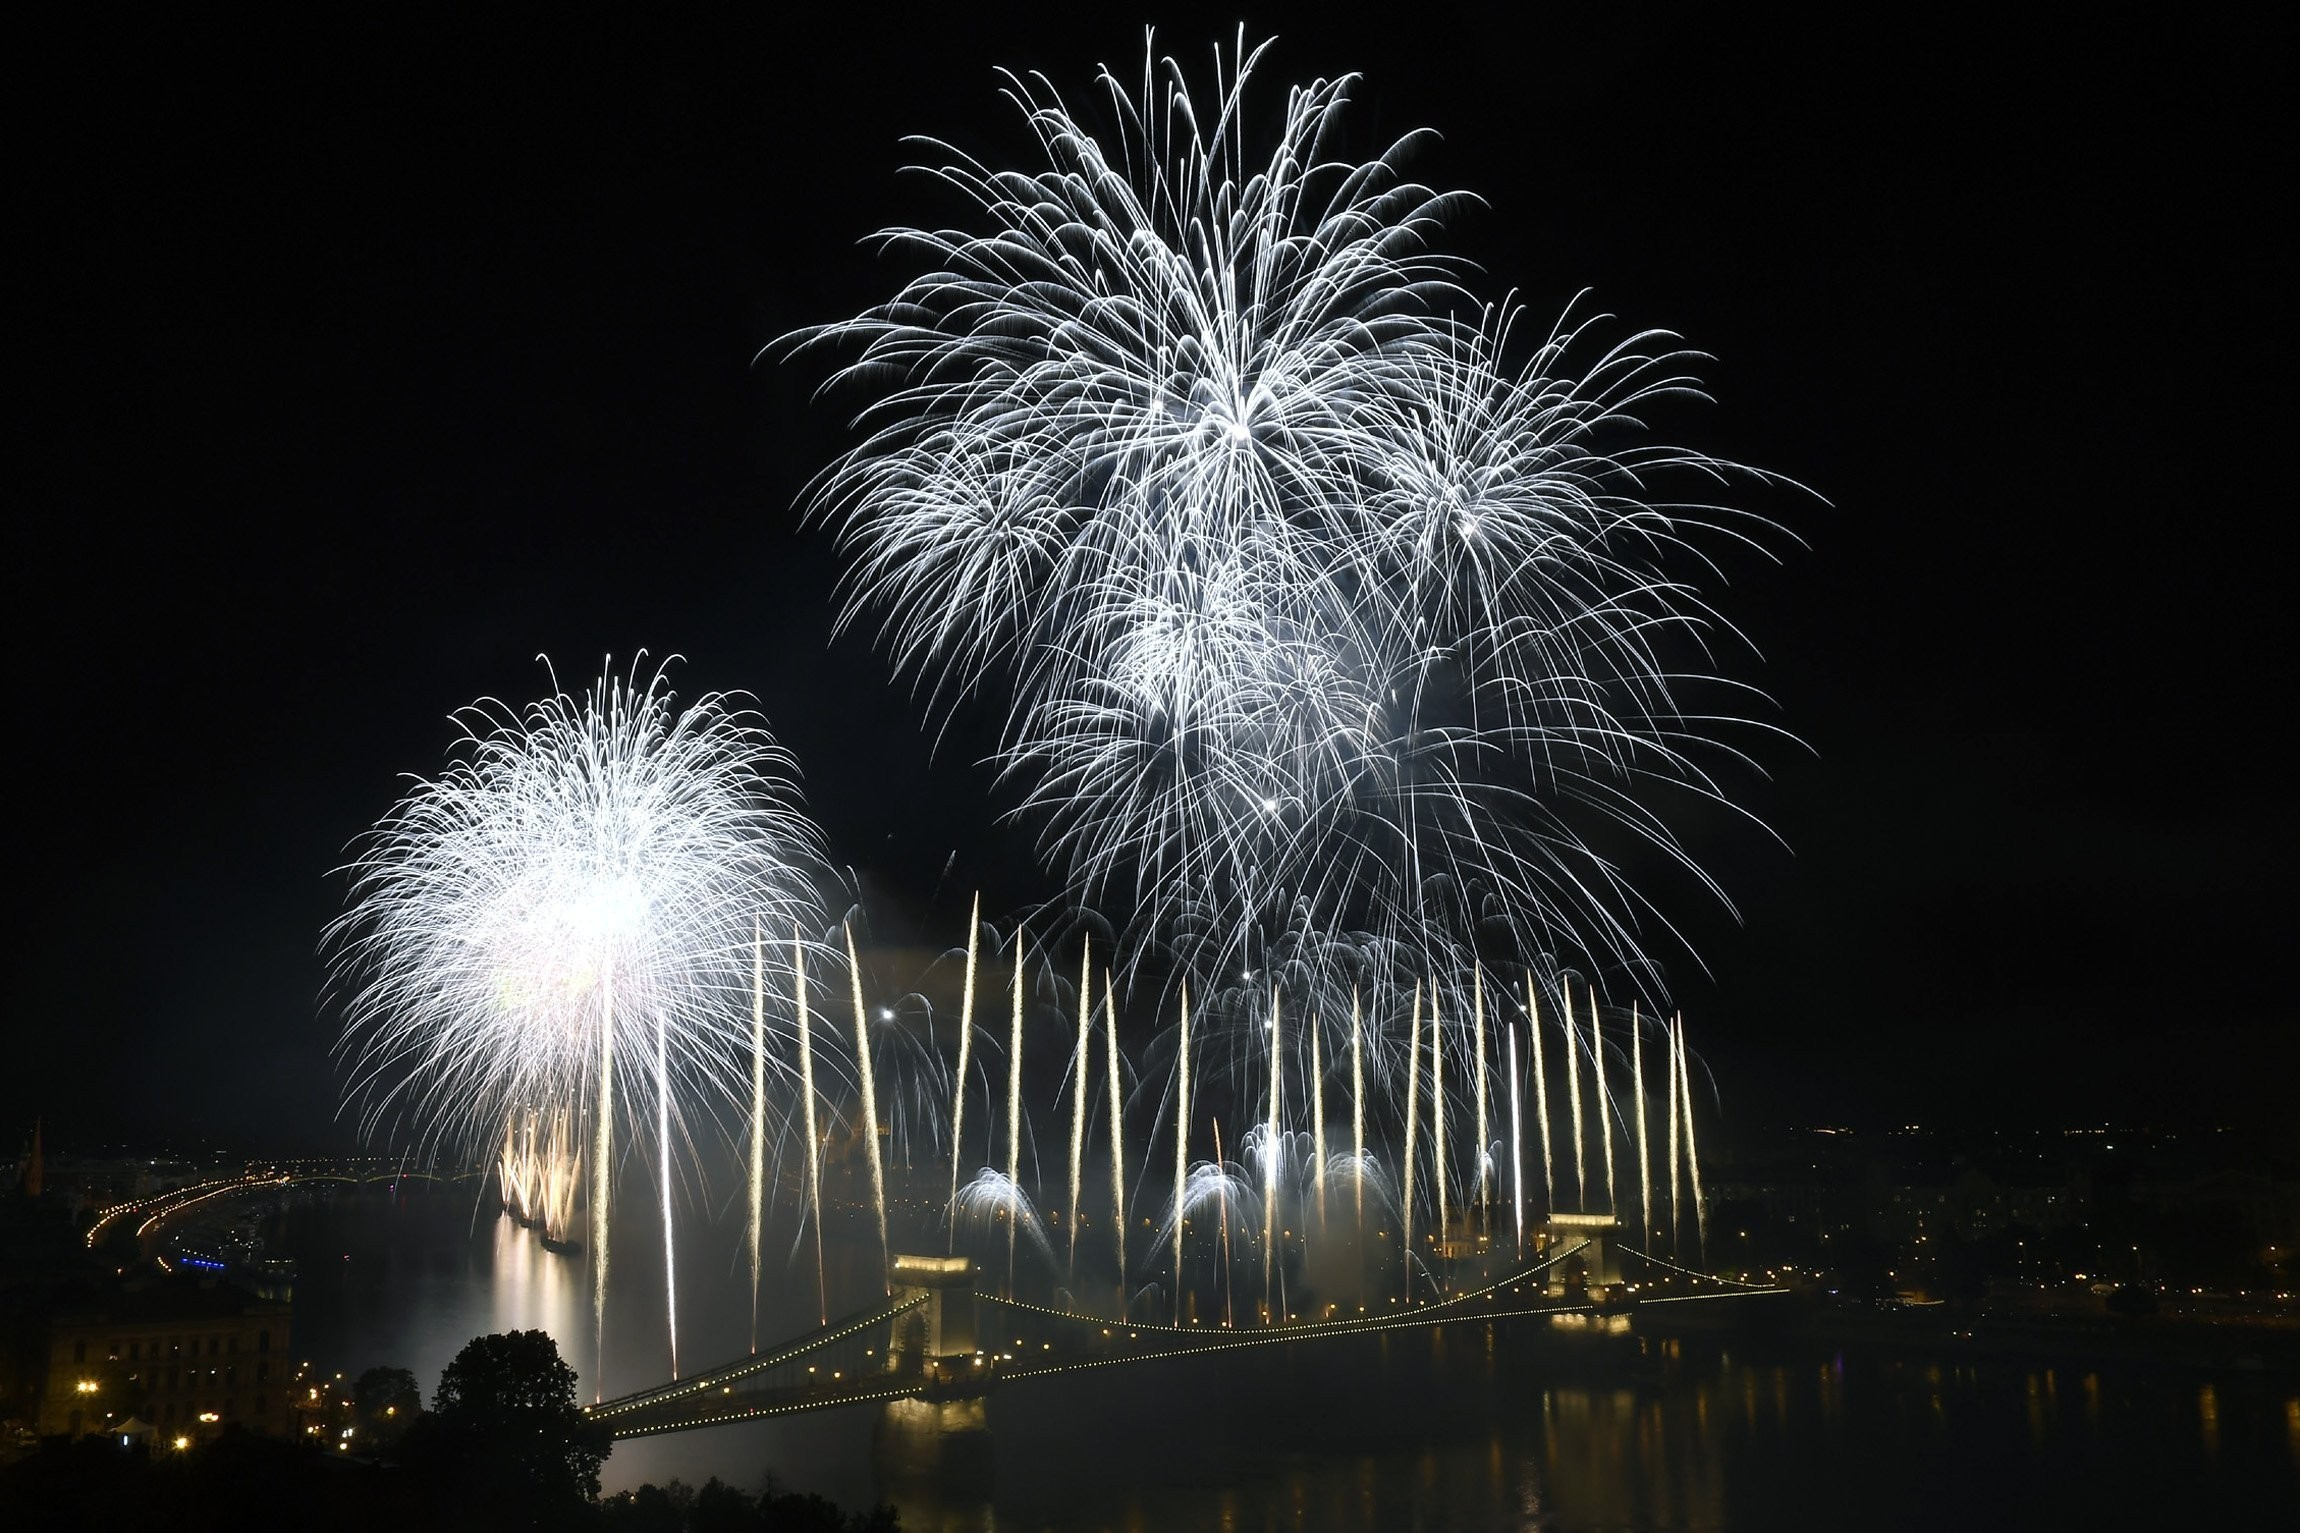 Augusztus 20. - Ünnepi tűzijáték Budapesten